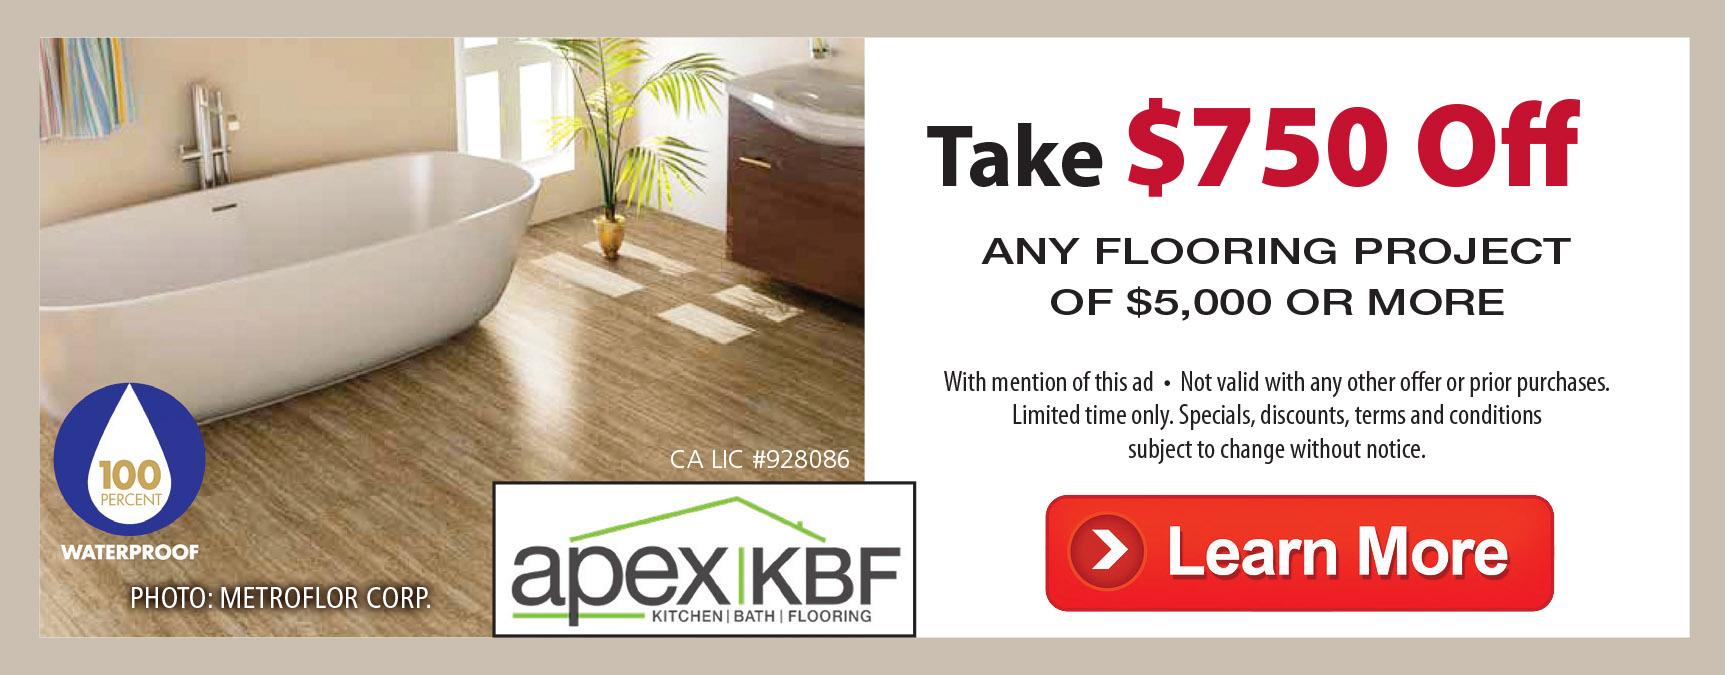 Apex Flooring_Offer_Reg_05-18.jpg